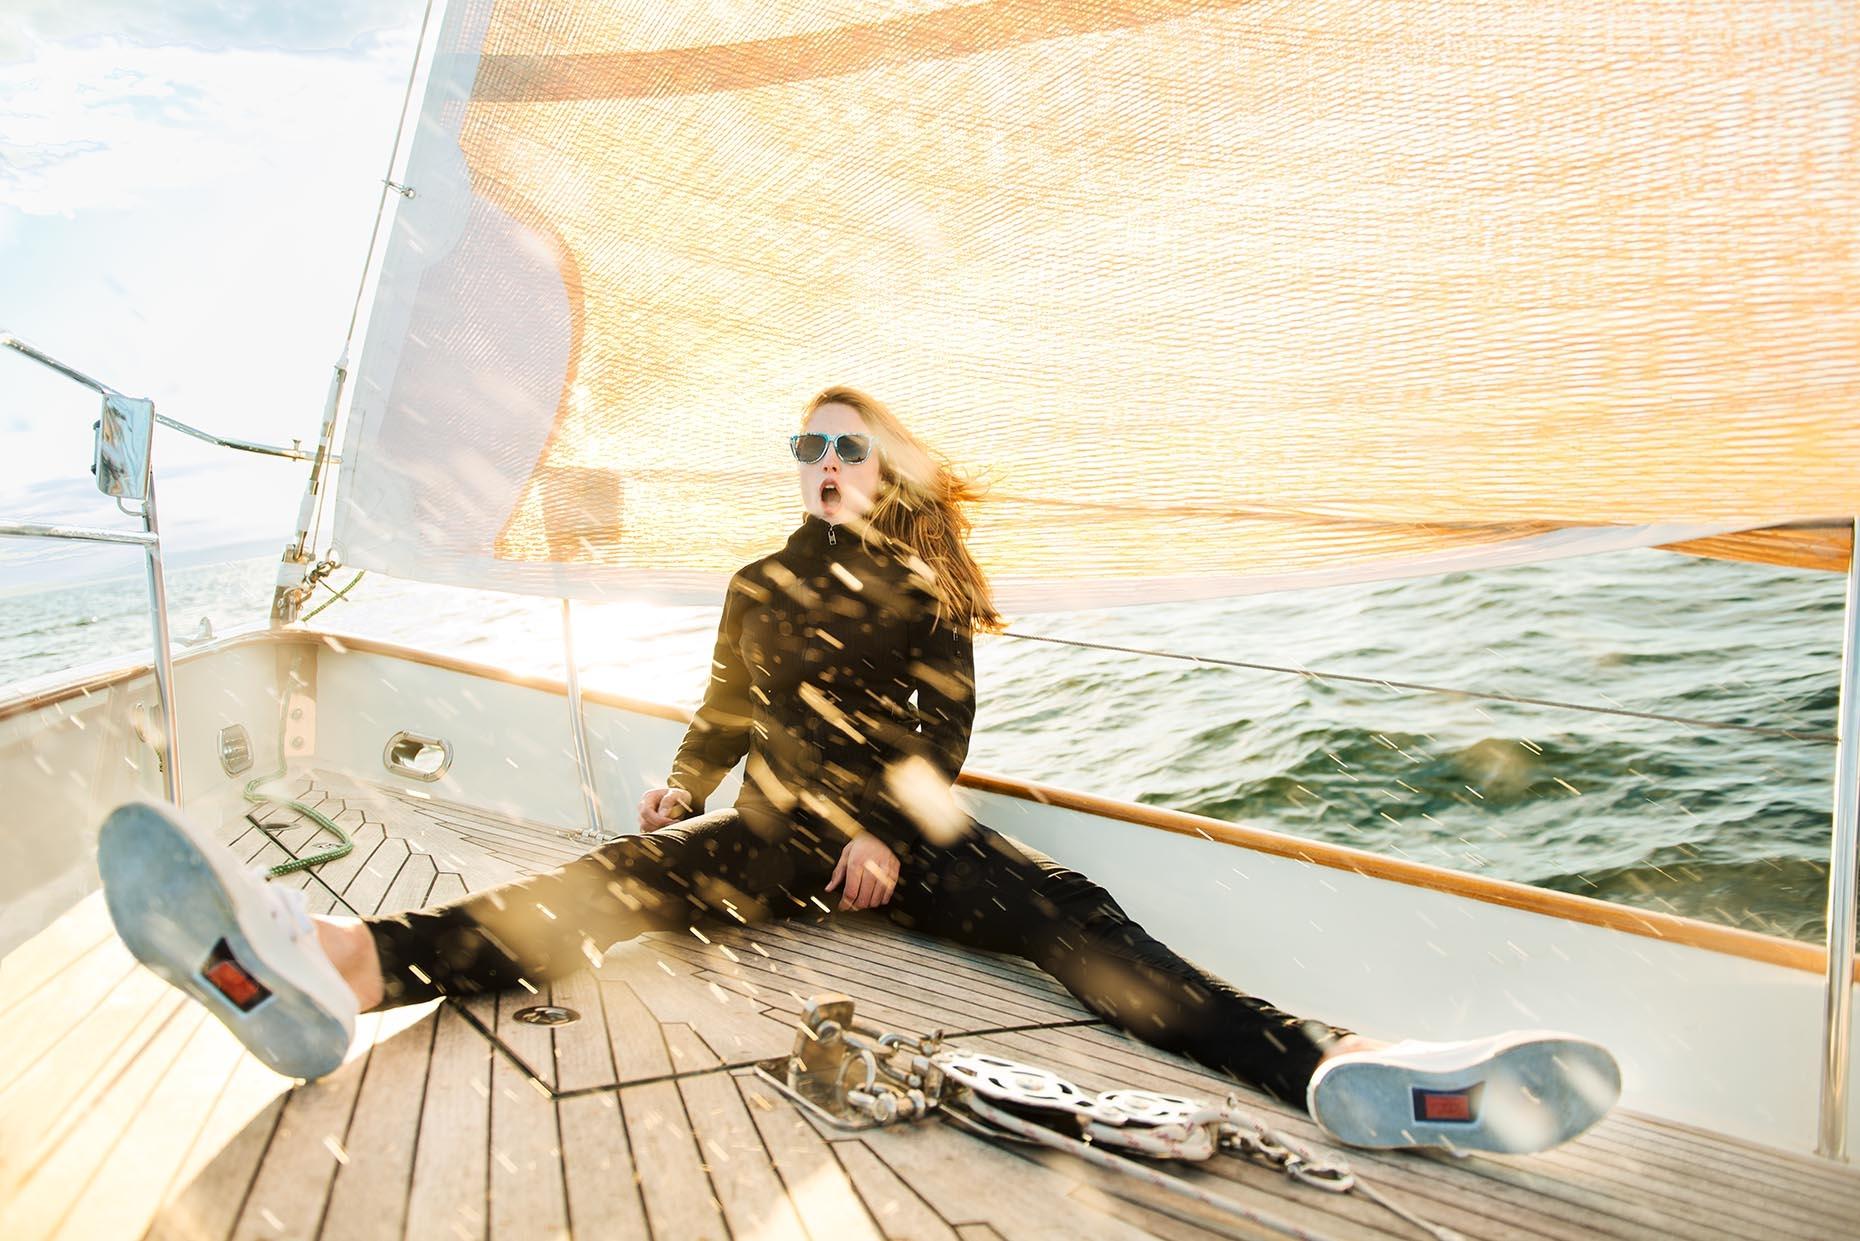 diana sailboat splash 1935flatfolio